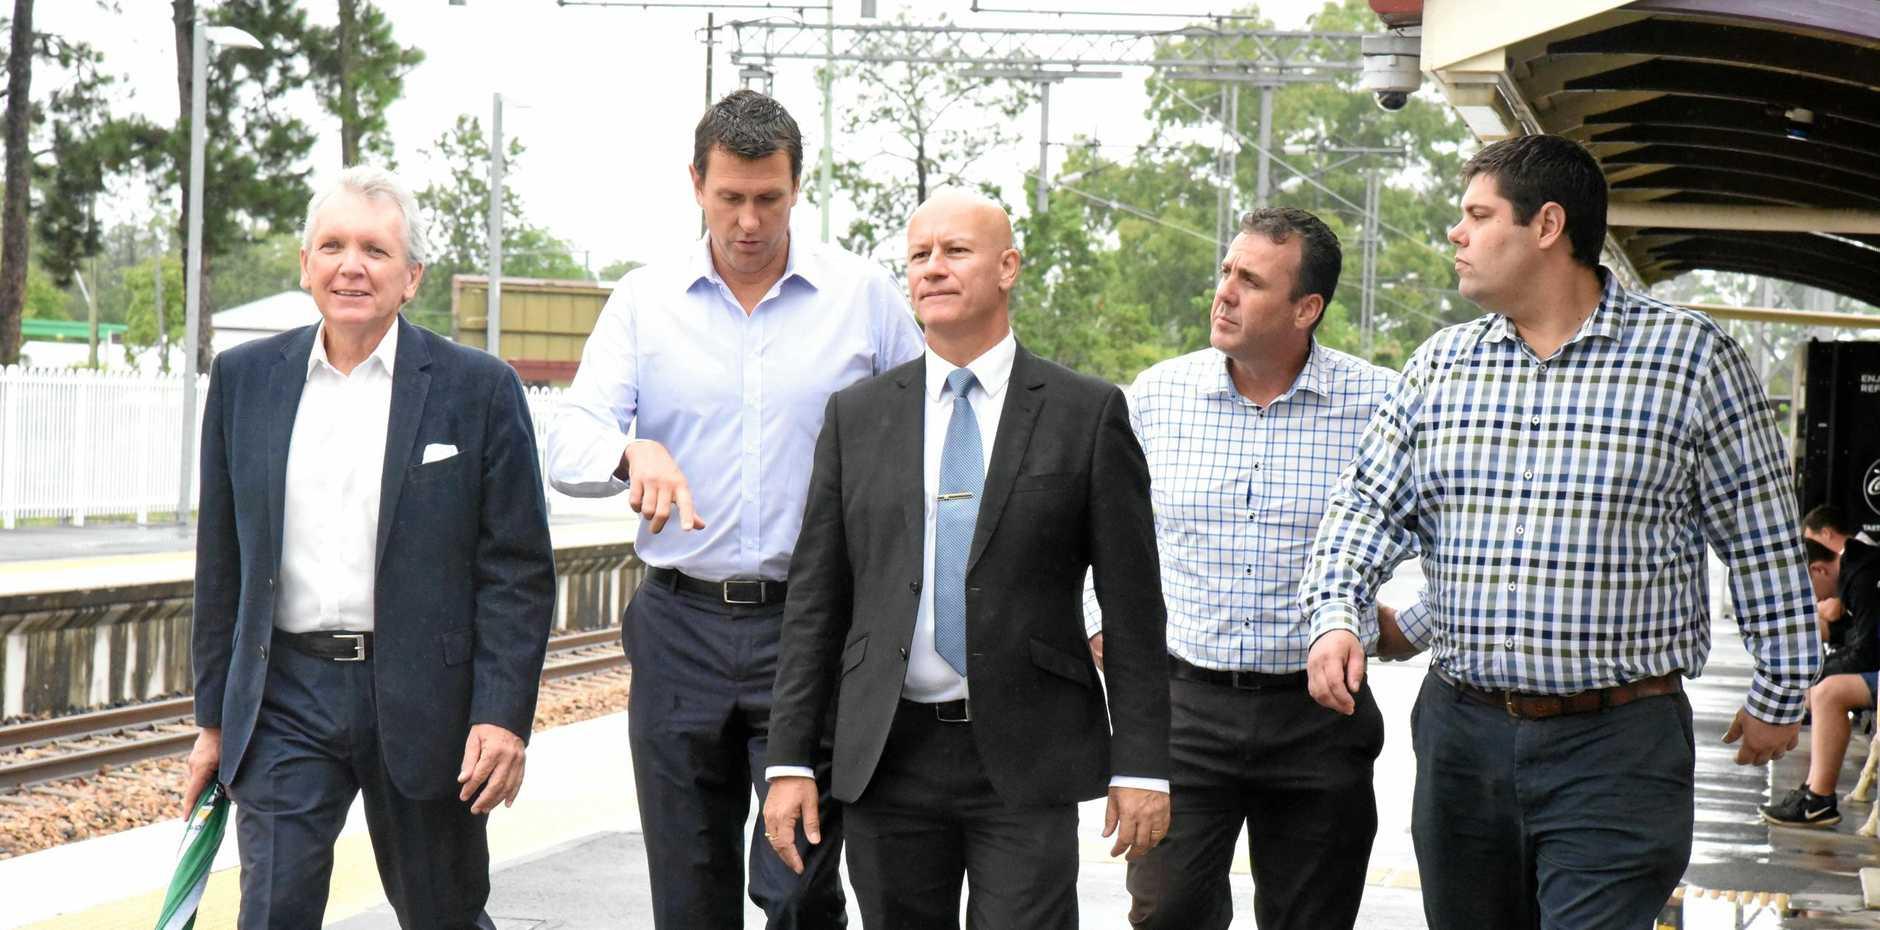 TALKING TRACK: LNP Shadow Transport Minister Steve Minnikin with Sunshine Coast LNP MPs Mark McArdle, Dan Purdie, Marty Hunt and Brent Mickelberg.